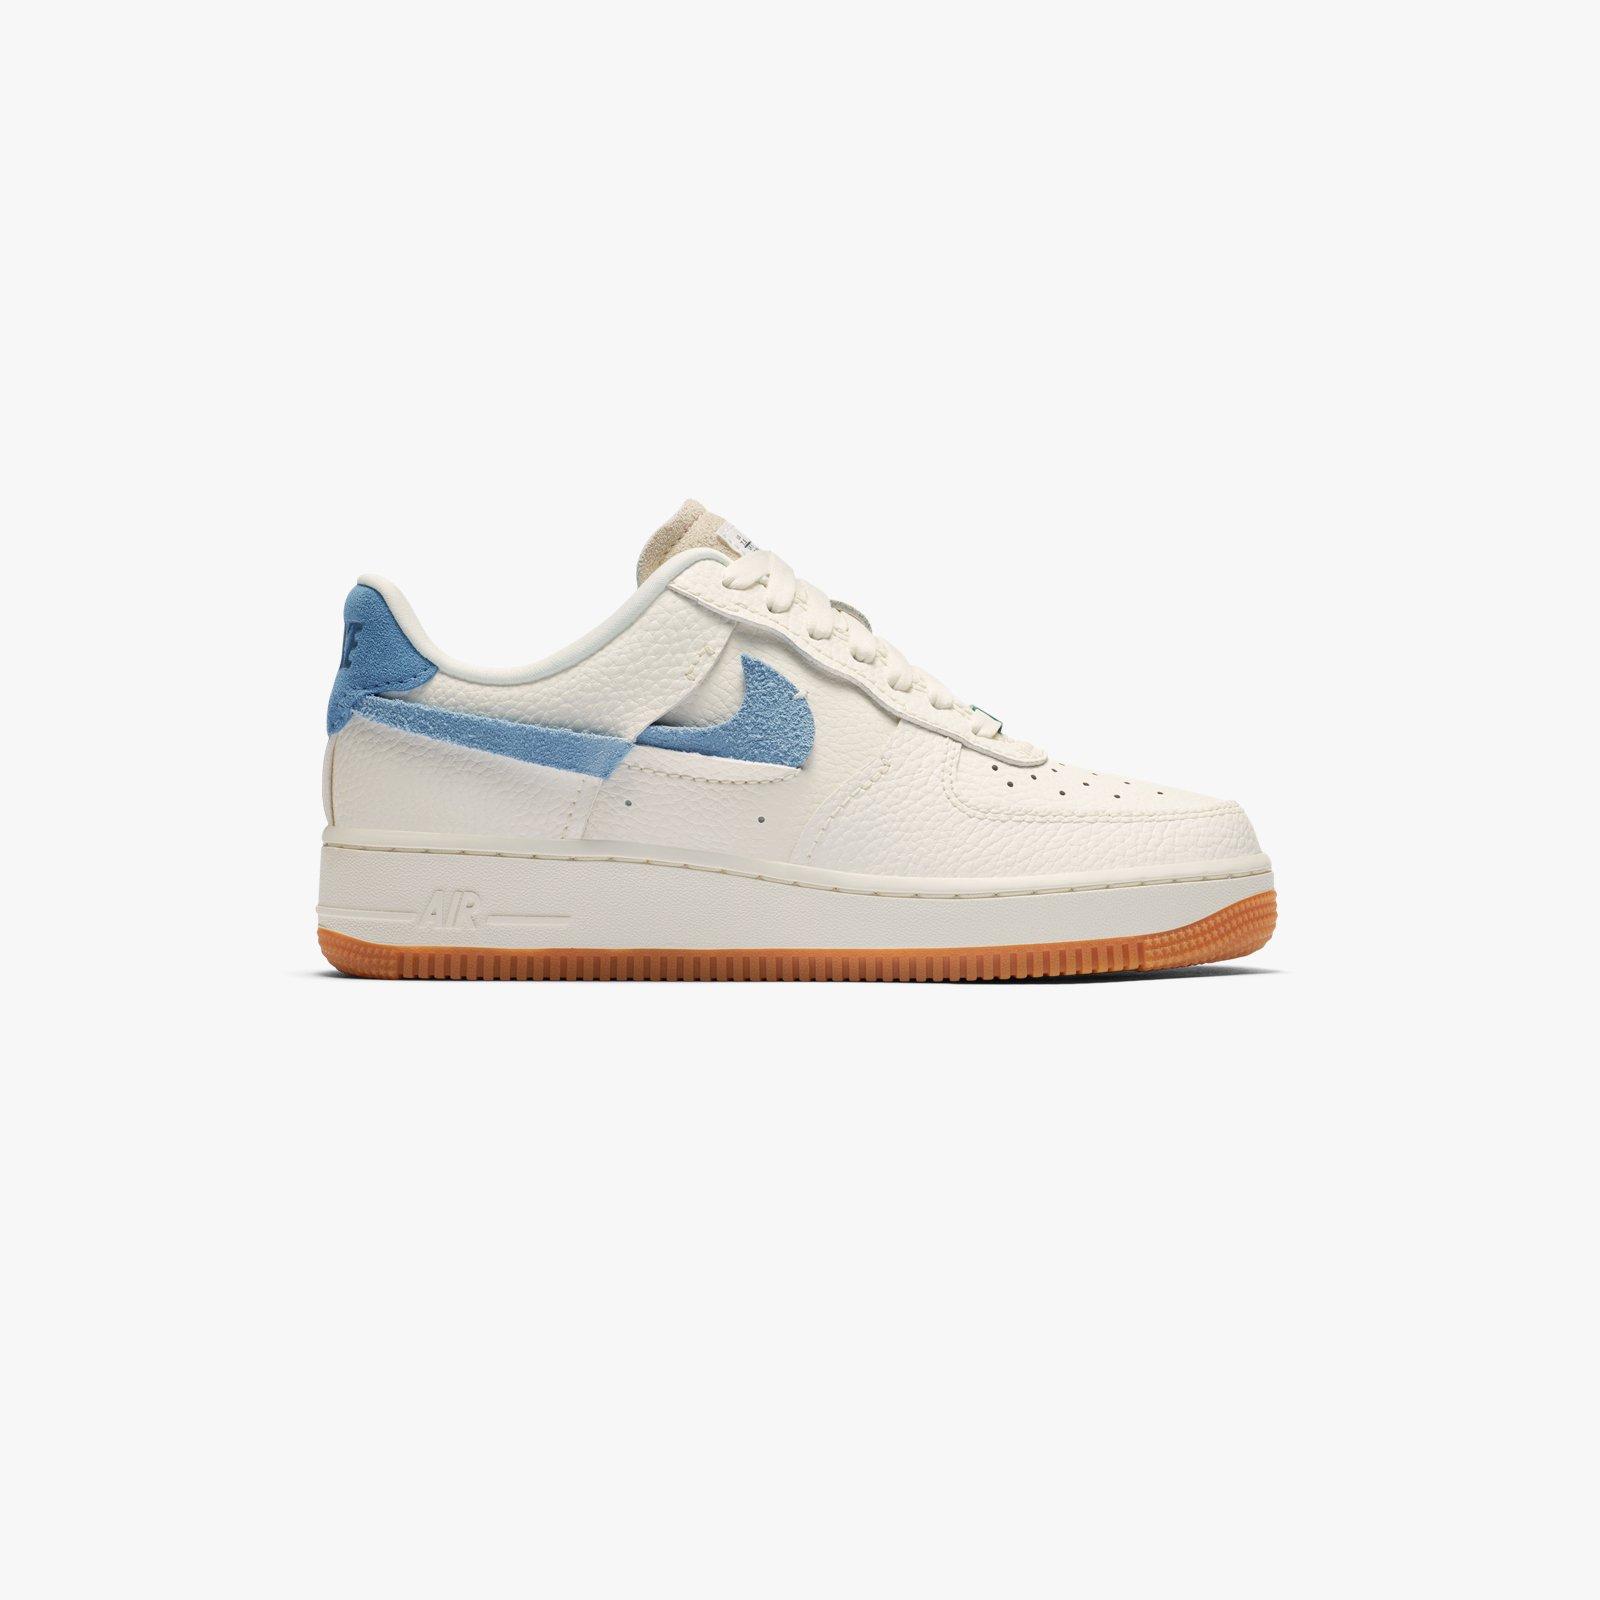 Nike Wmns Air Force 1 07 LXX Bv0740 100 Sneakersnstuff